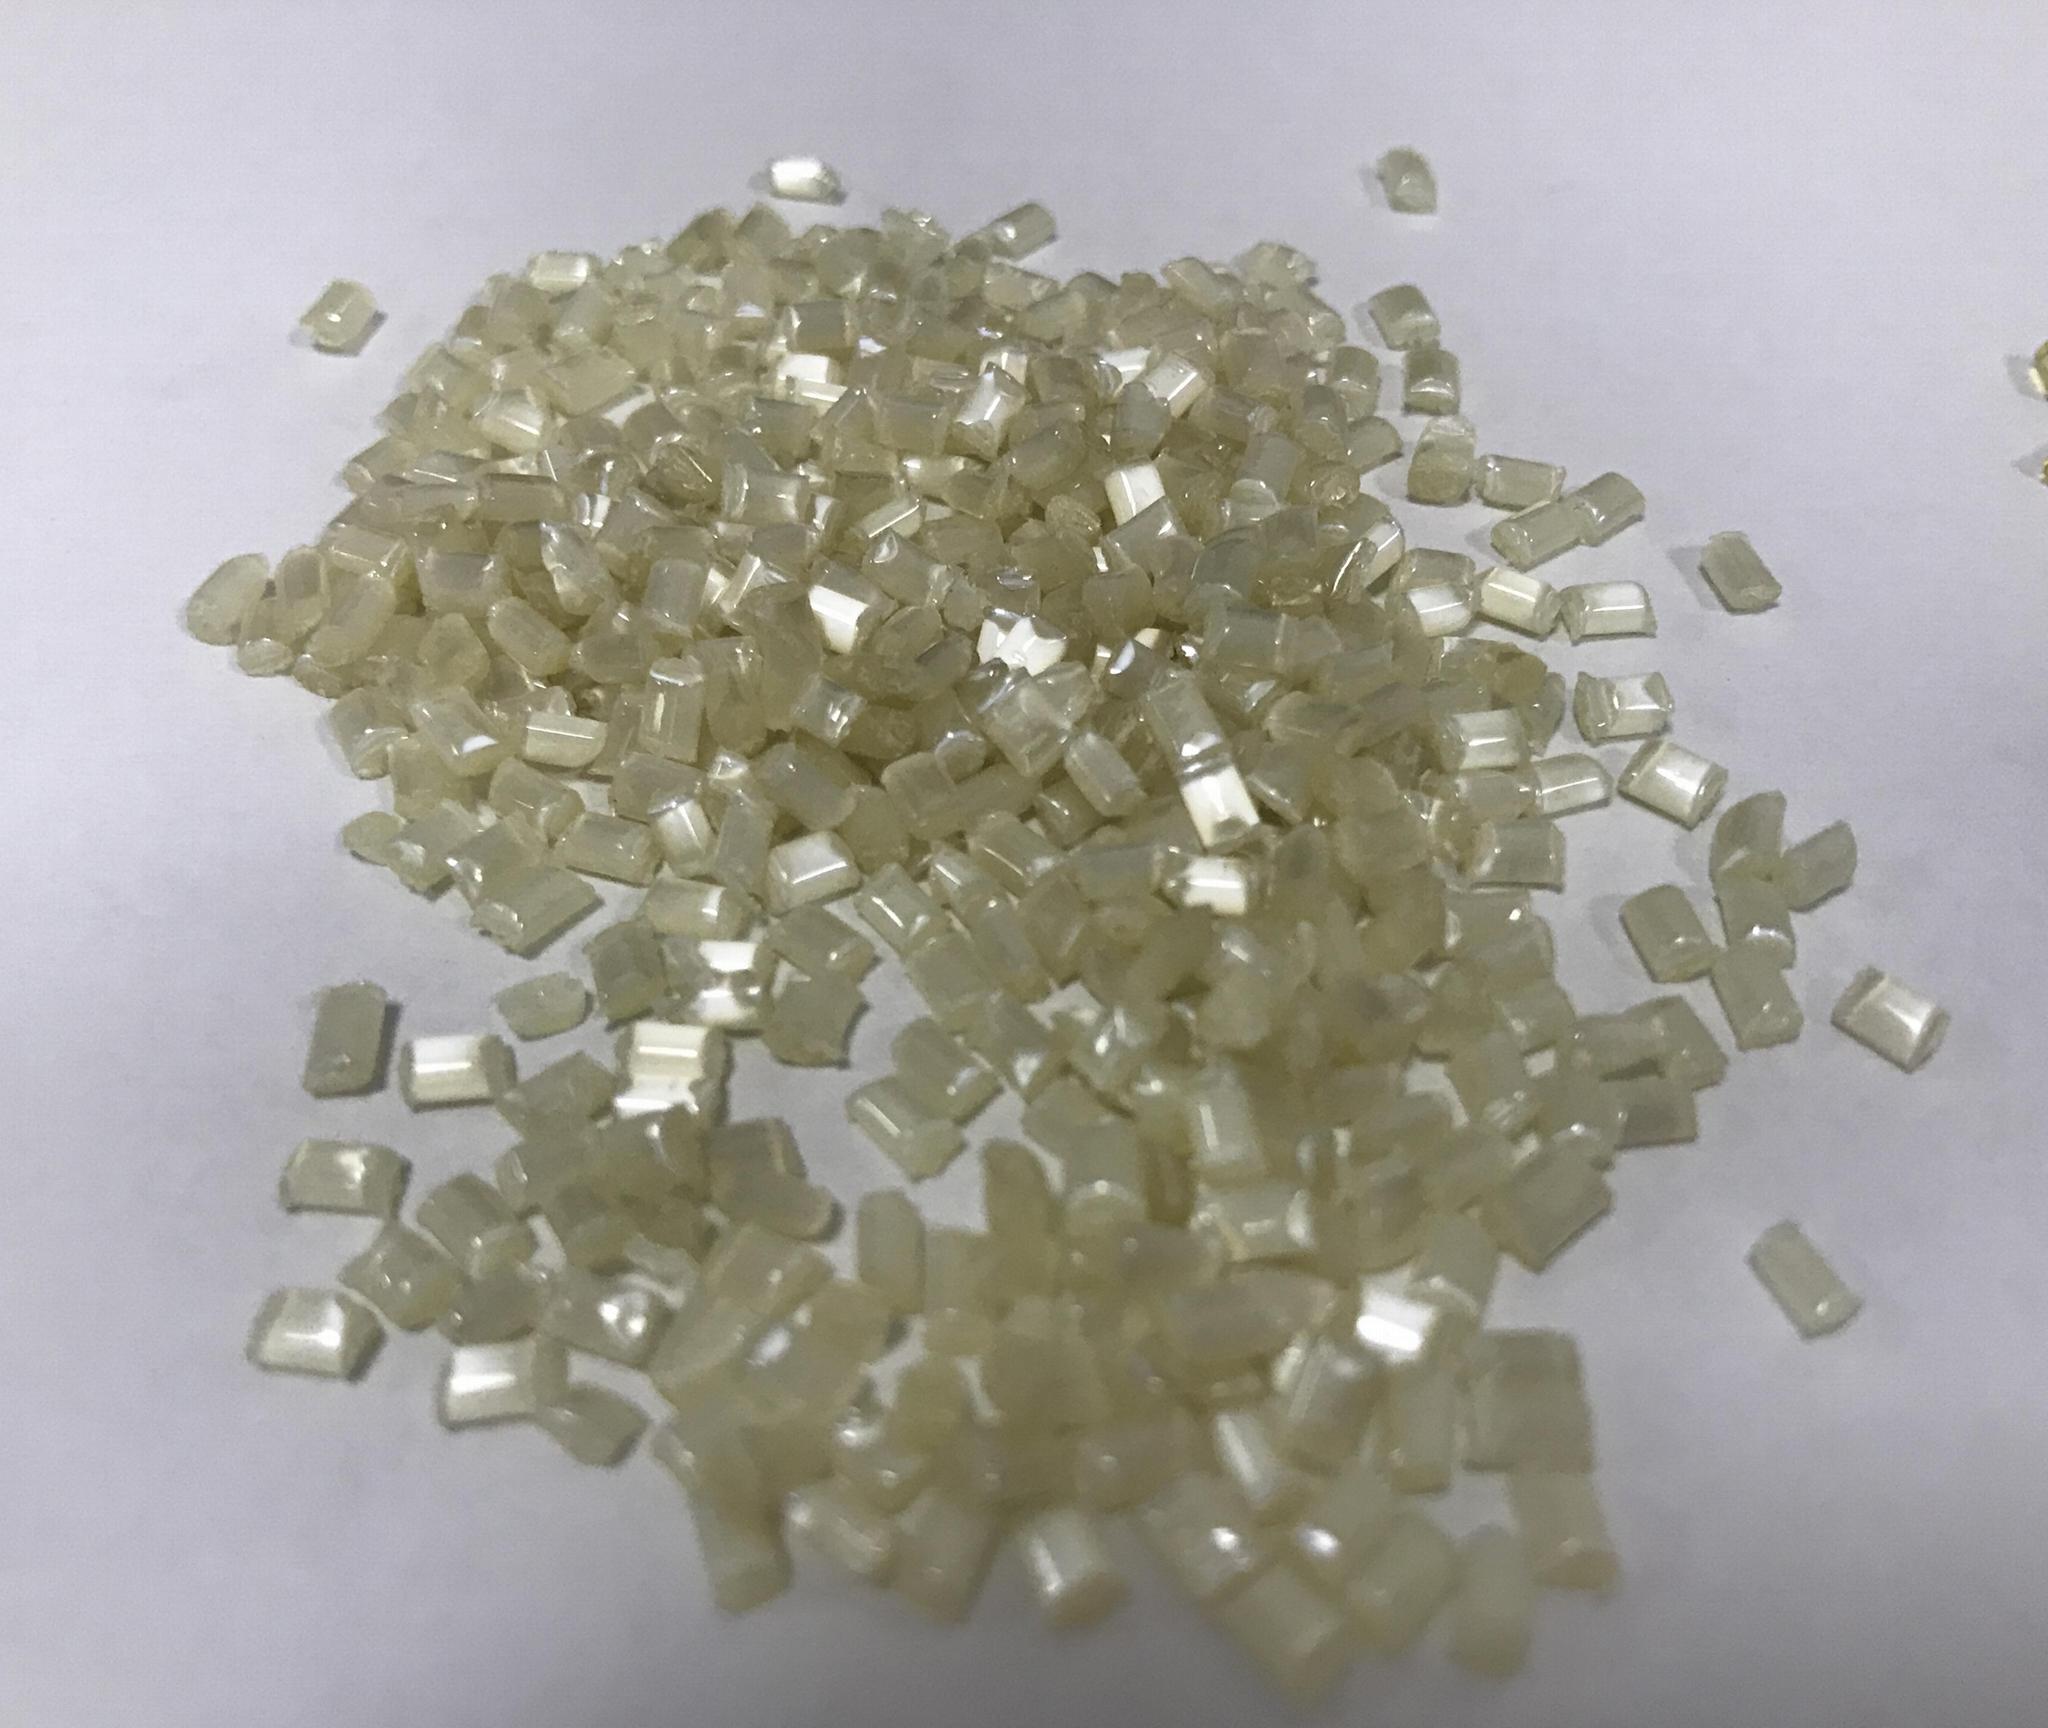 PEI Ultem 9085 SABIC Polyetherimide Resins 1